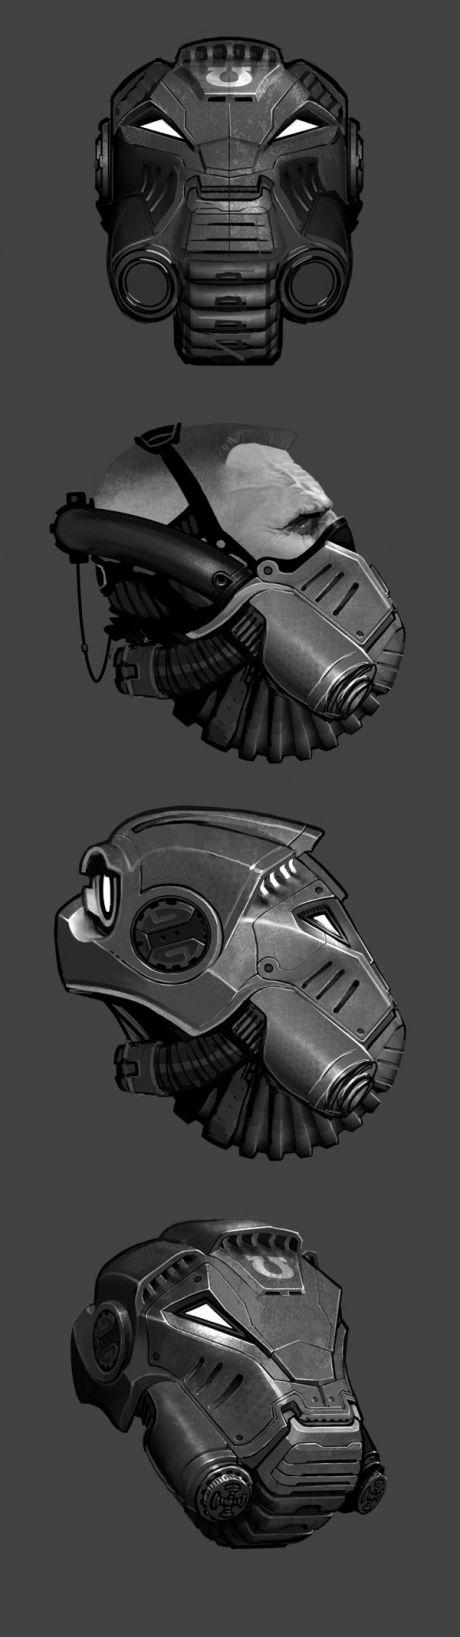 Inspiration | Warhammer 40k Character Design Illustration